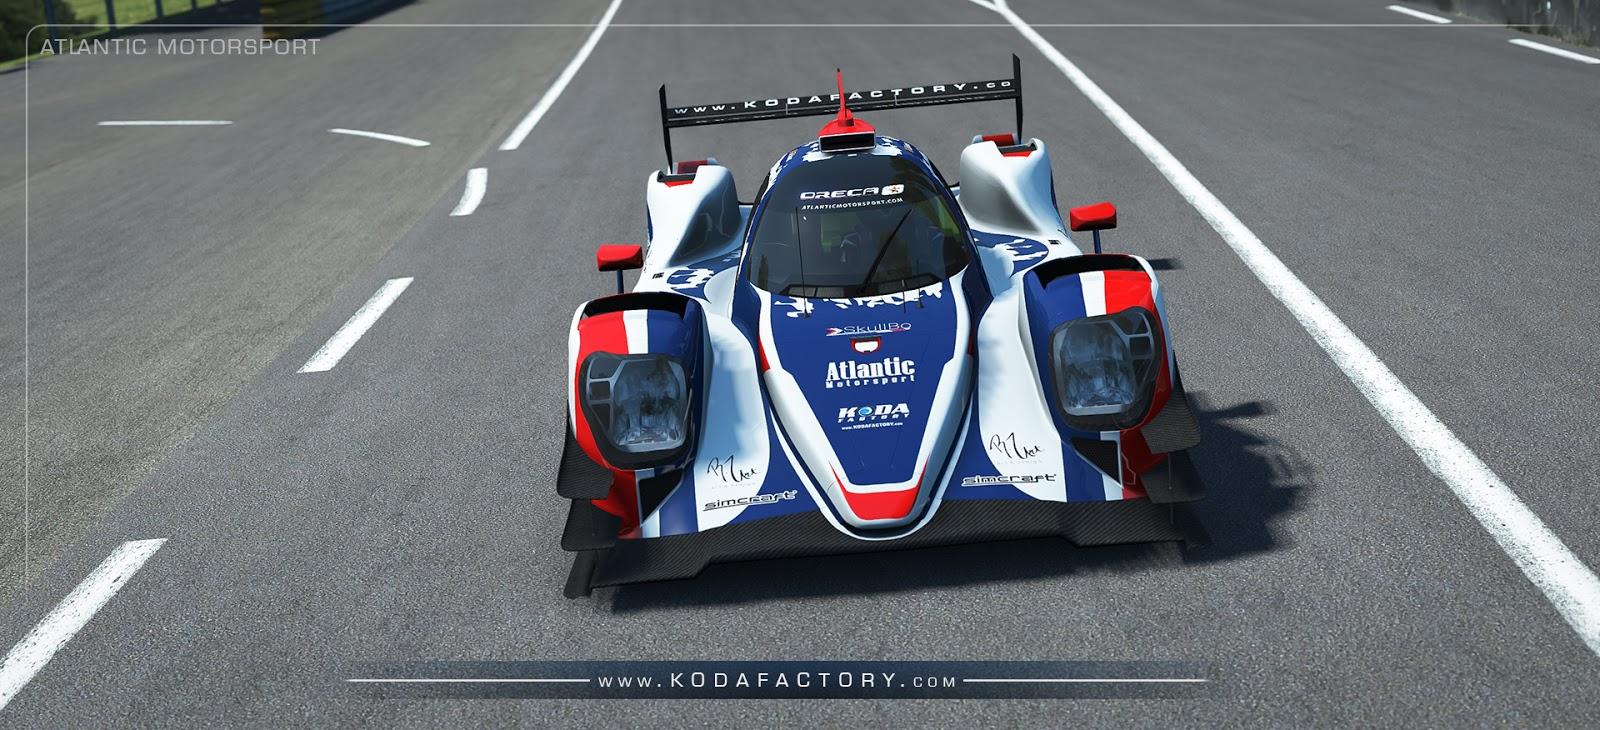 Koda Factory: Atlantic Motorsport Oreca 07 LMP2   rFactor2